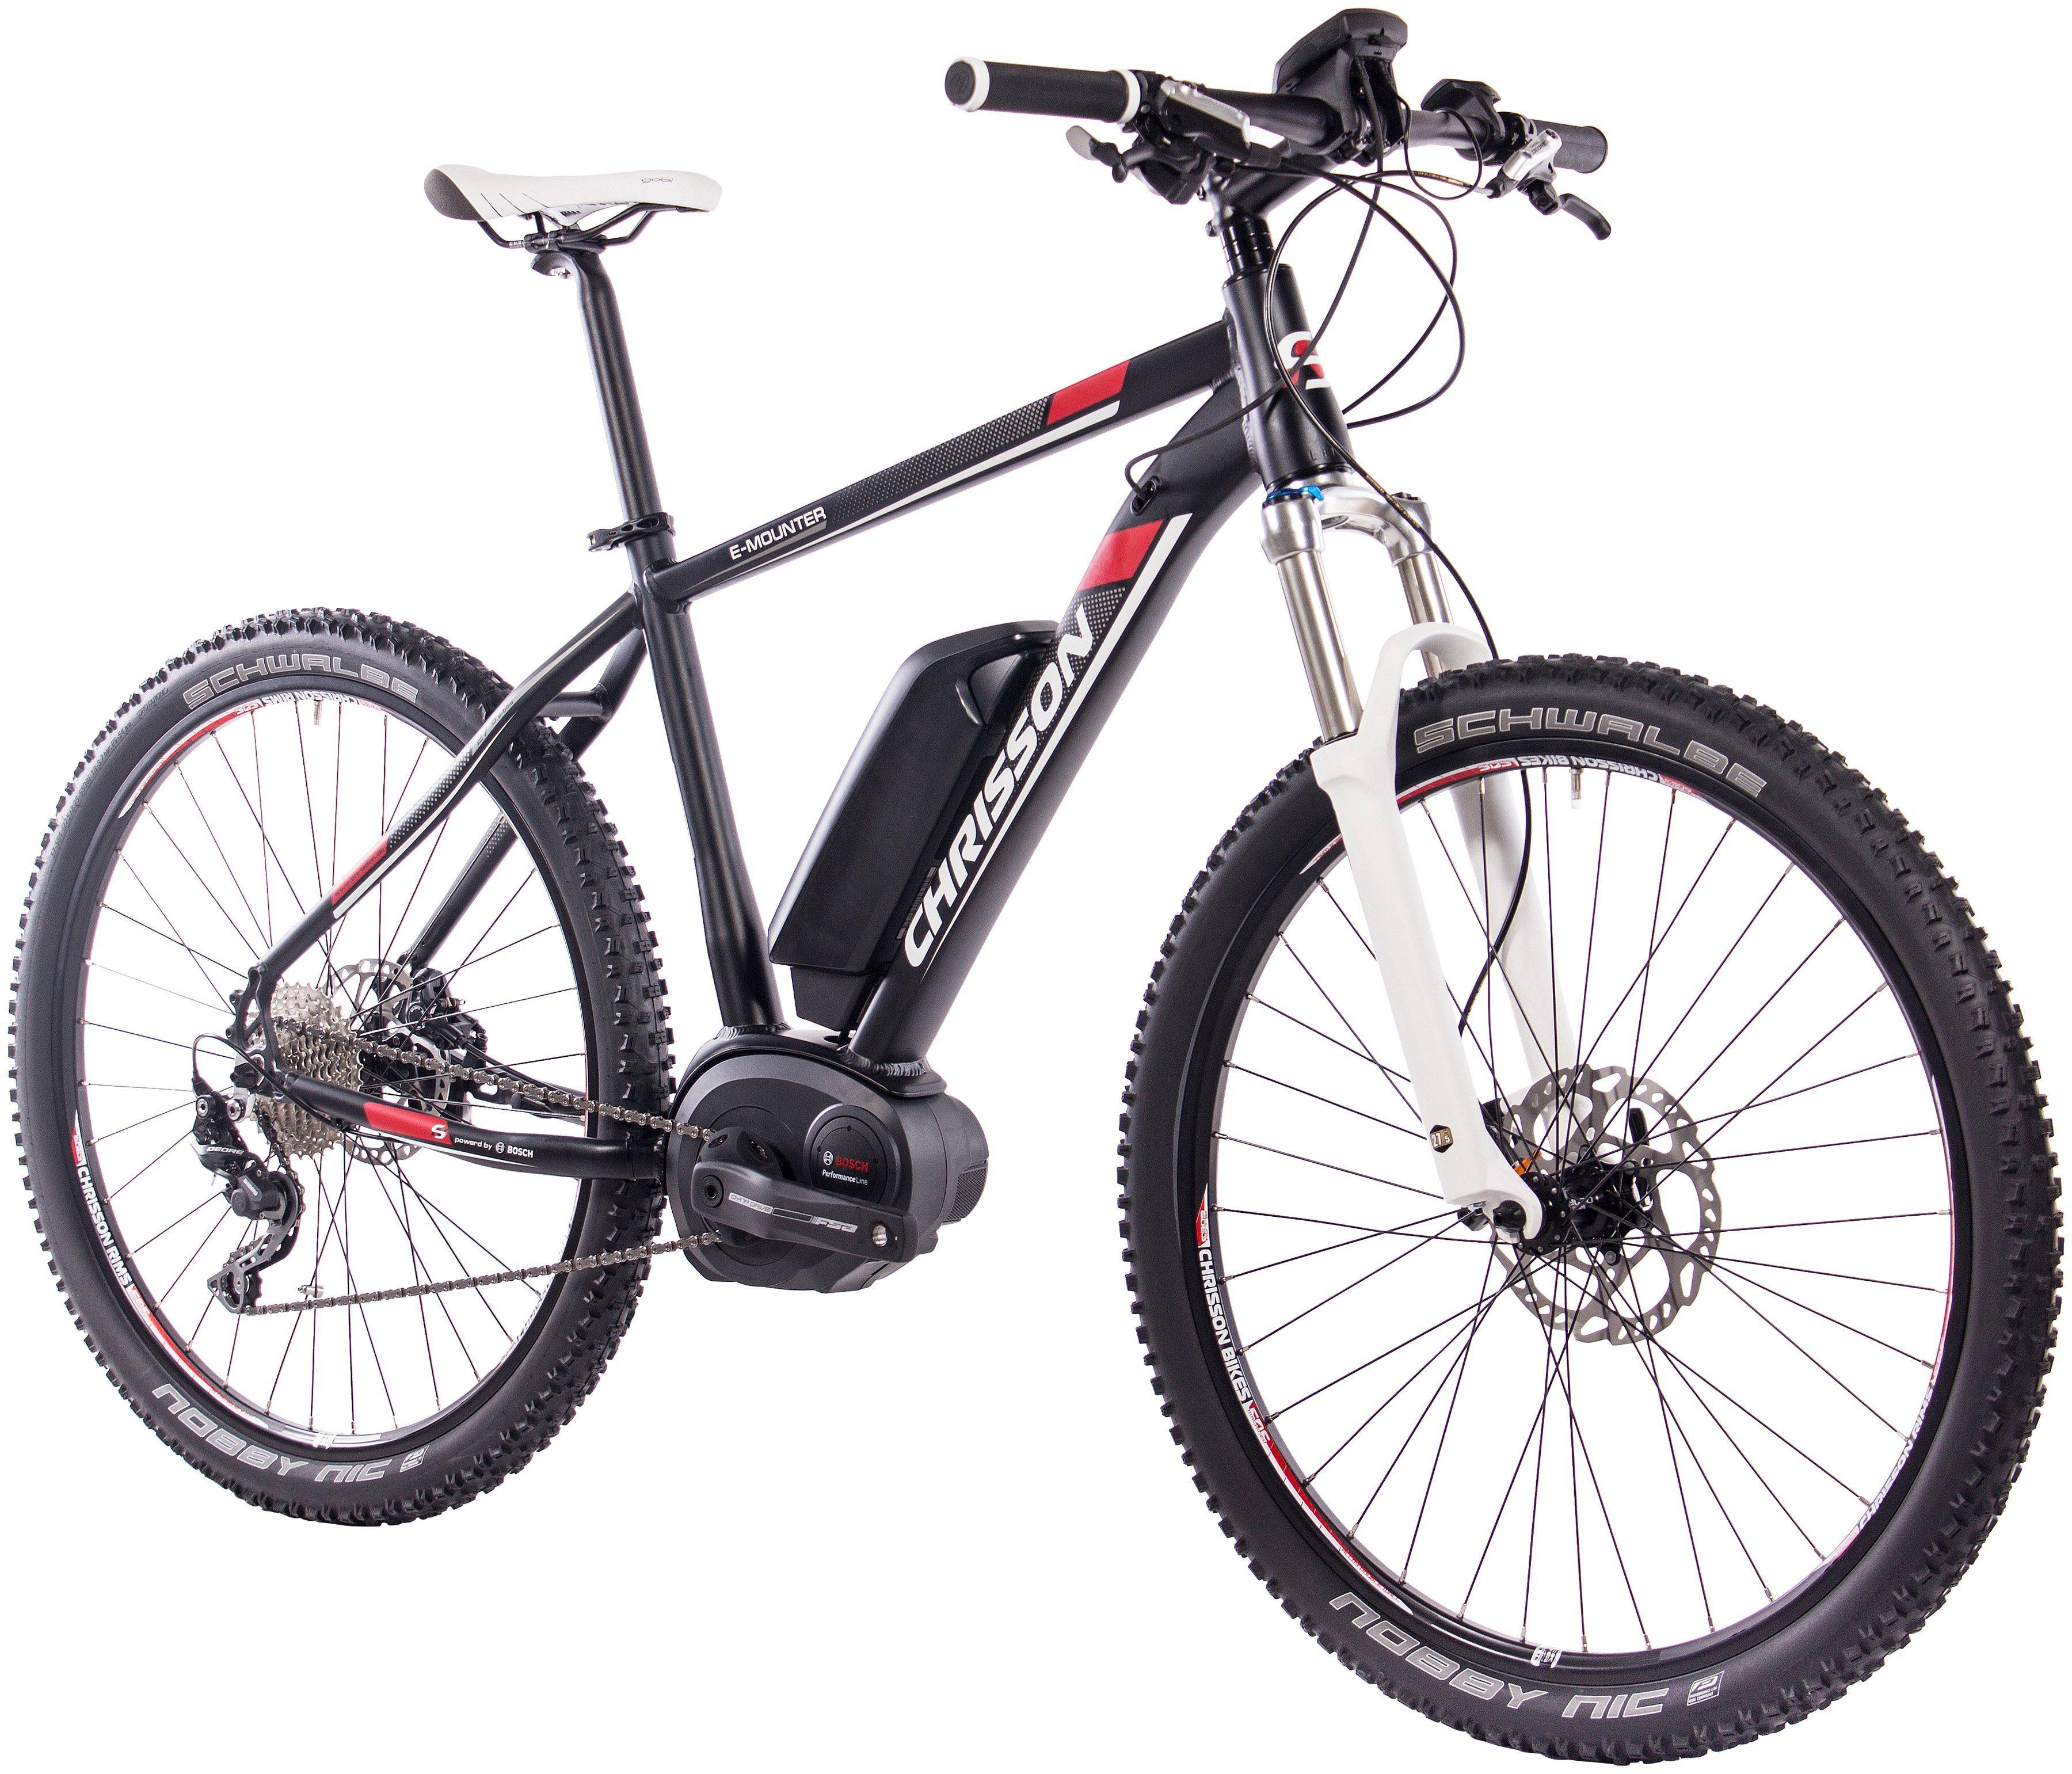 CHRISSON E-Bike Mountainbike »E-MOUNTER«, 27,5 Zoll, 10 Gang, Mittelmotor, 400 Wh, RH48